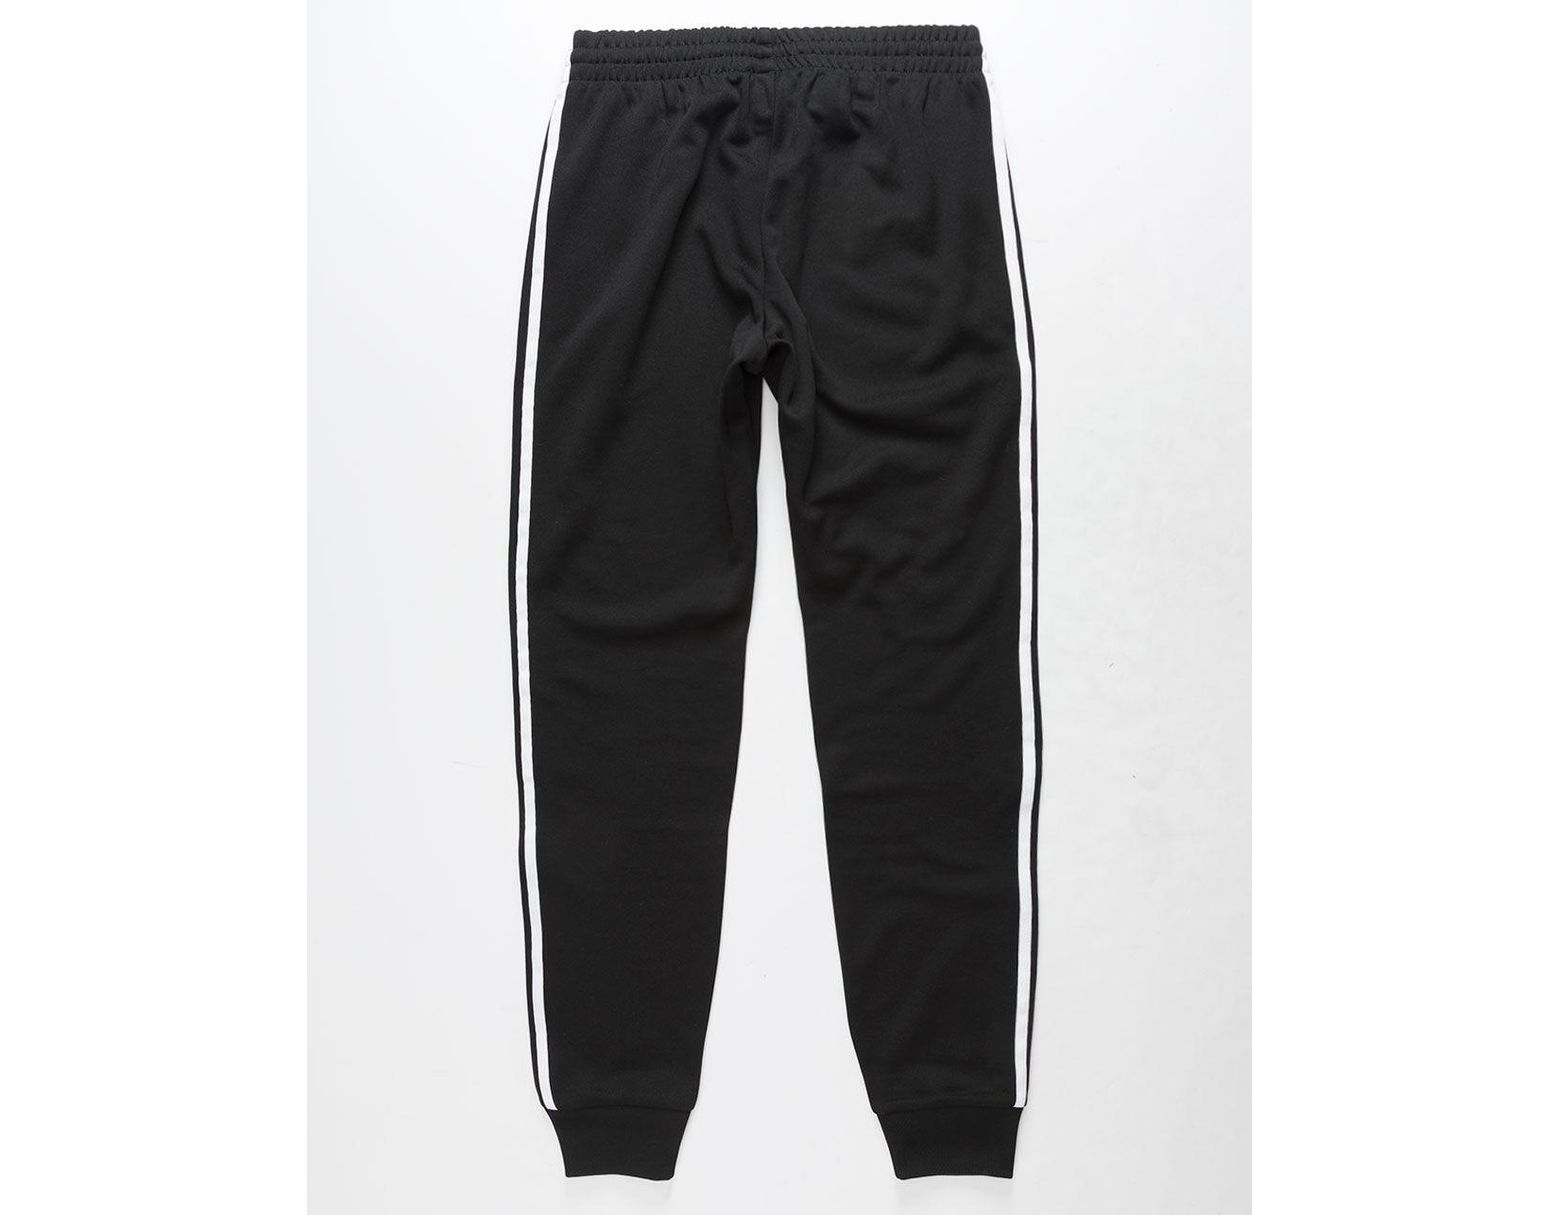 64c172e30 adidas Originals Side Stripe Mens Track Pants in Black for Men - Lyst